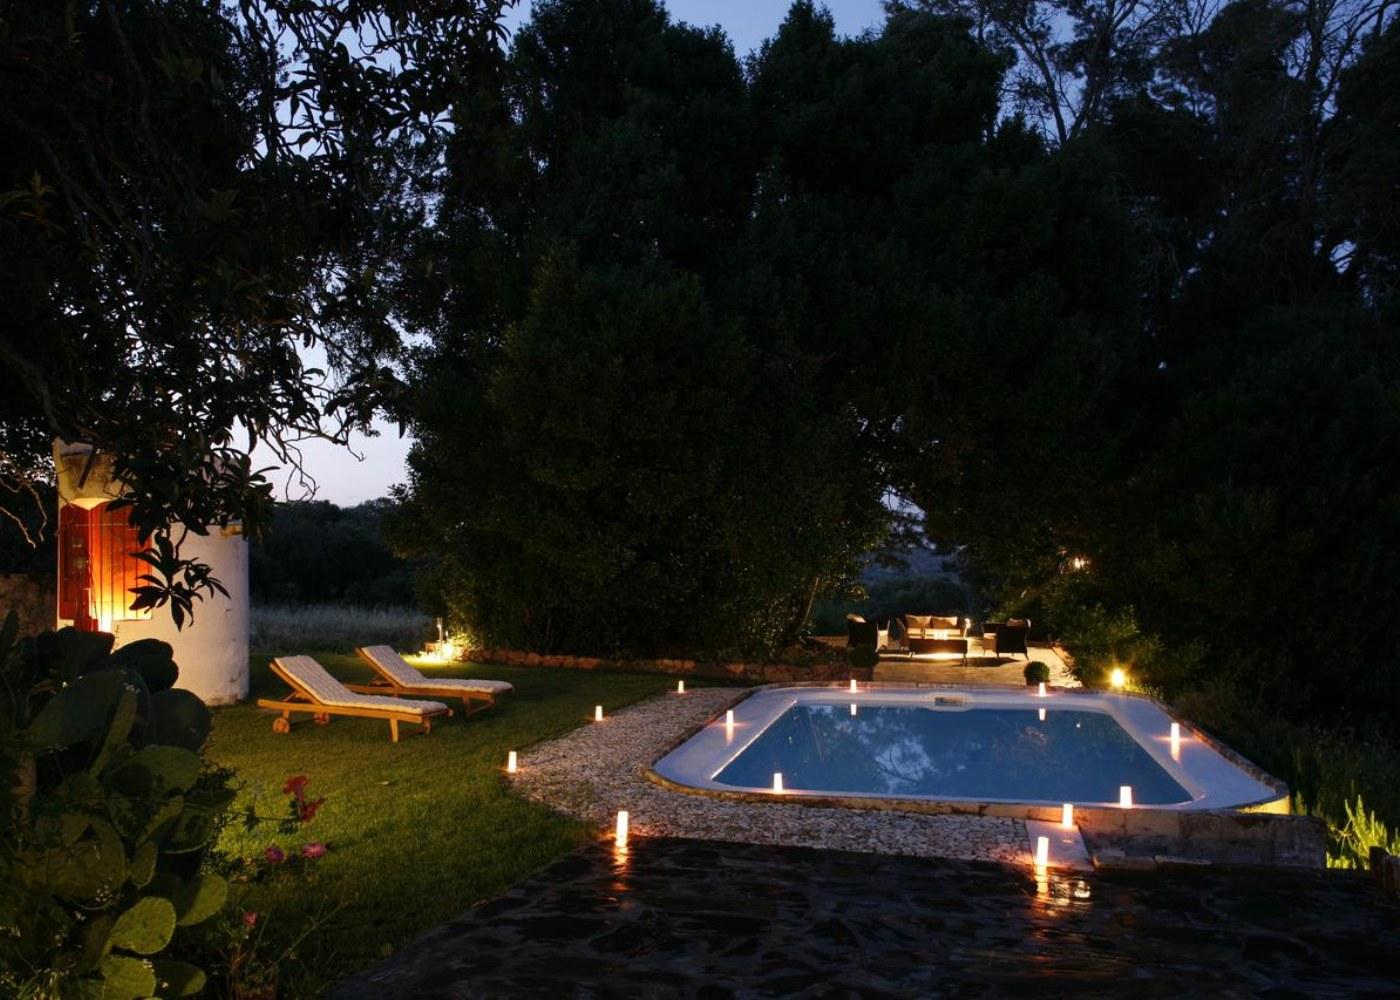 Imani Country House Eco-resort